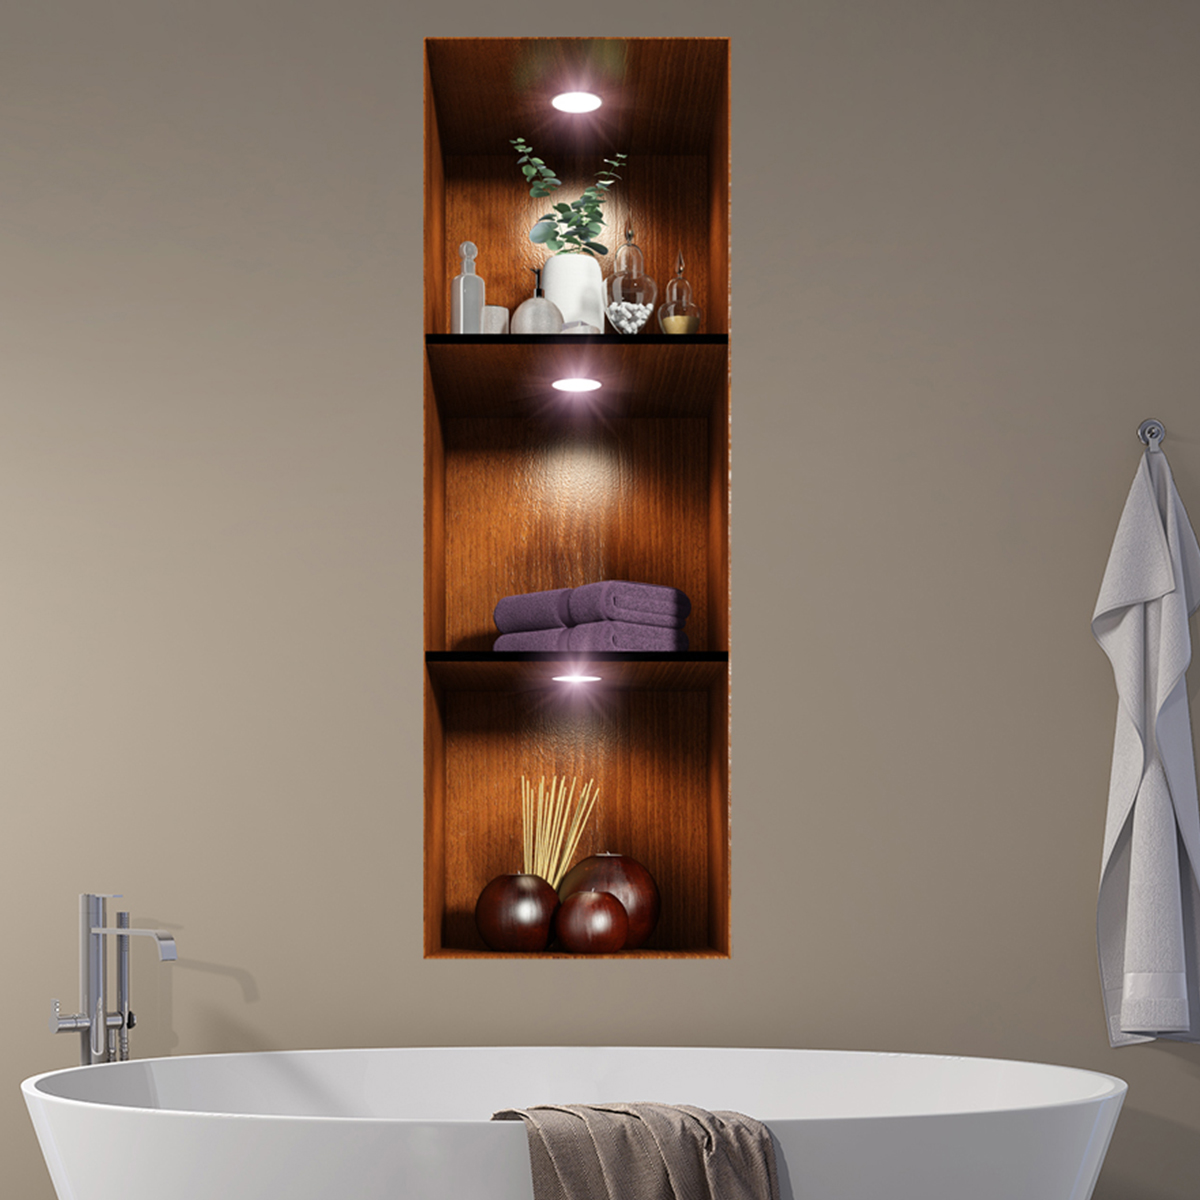 spa salle de bain relooking salle de bain spa suite et fin with spa salle de bain perfect. Black Bedroom Furniture Sets. Home Design Ideas